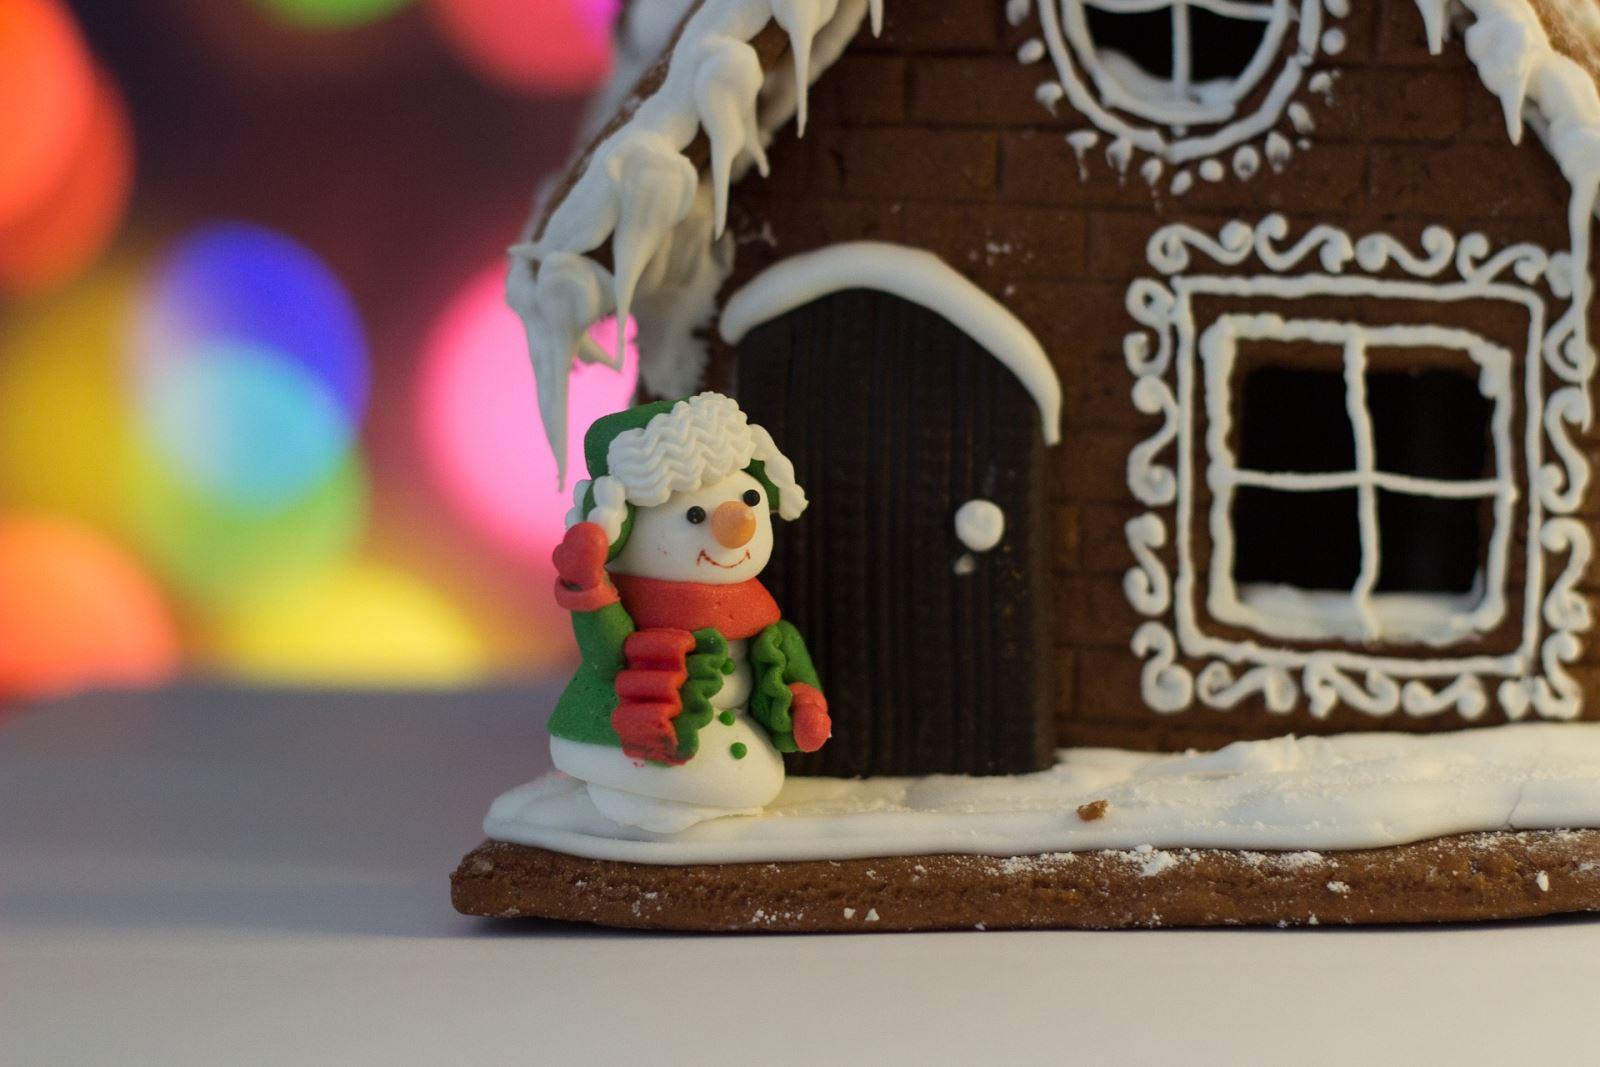 Cute snowman cake decoration